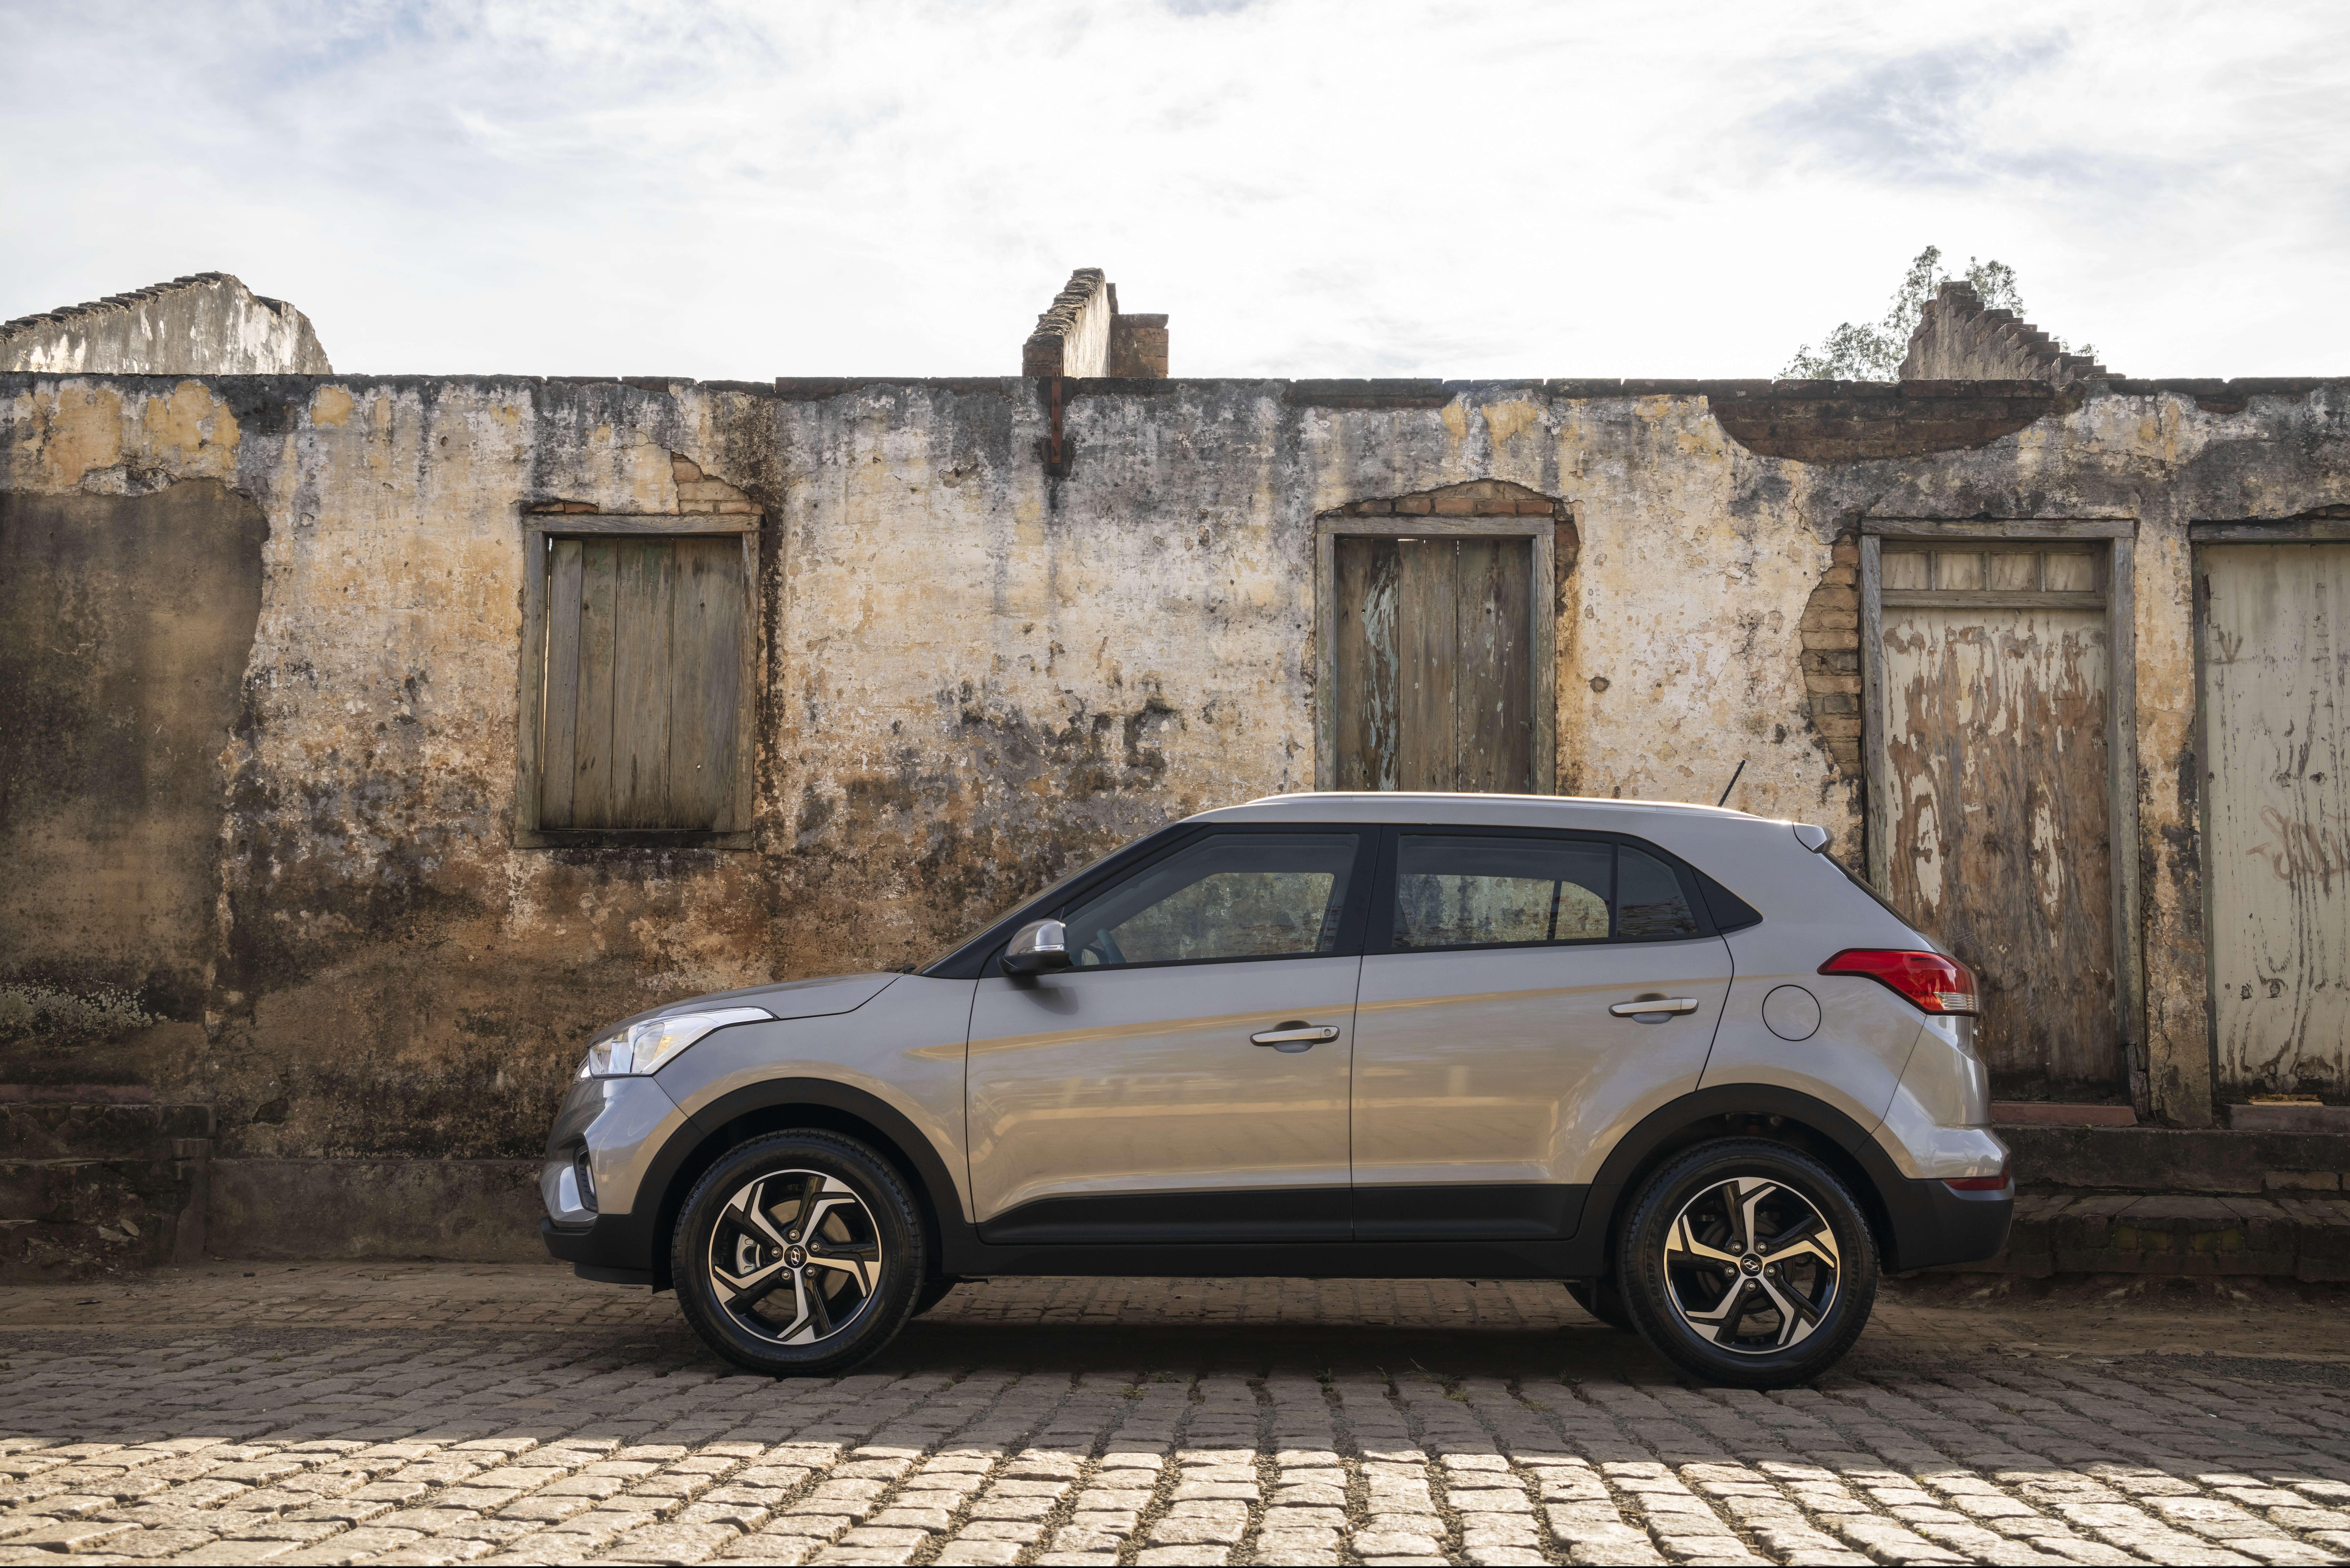 Hyundai-Creta-Smart-Plus-1.6-AT-e1597248652542.jpg